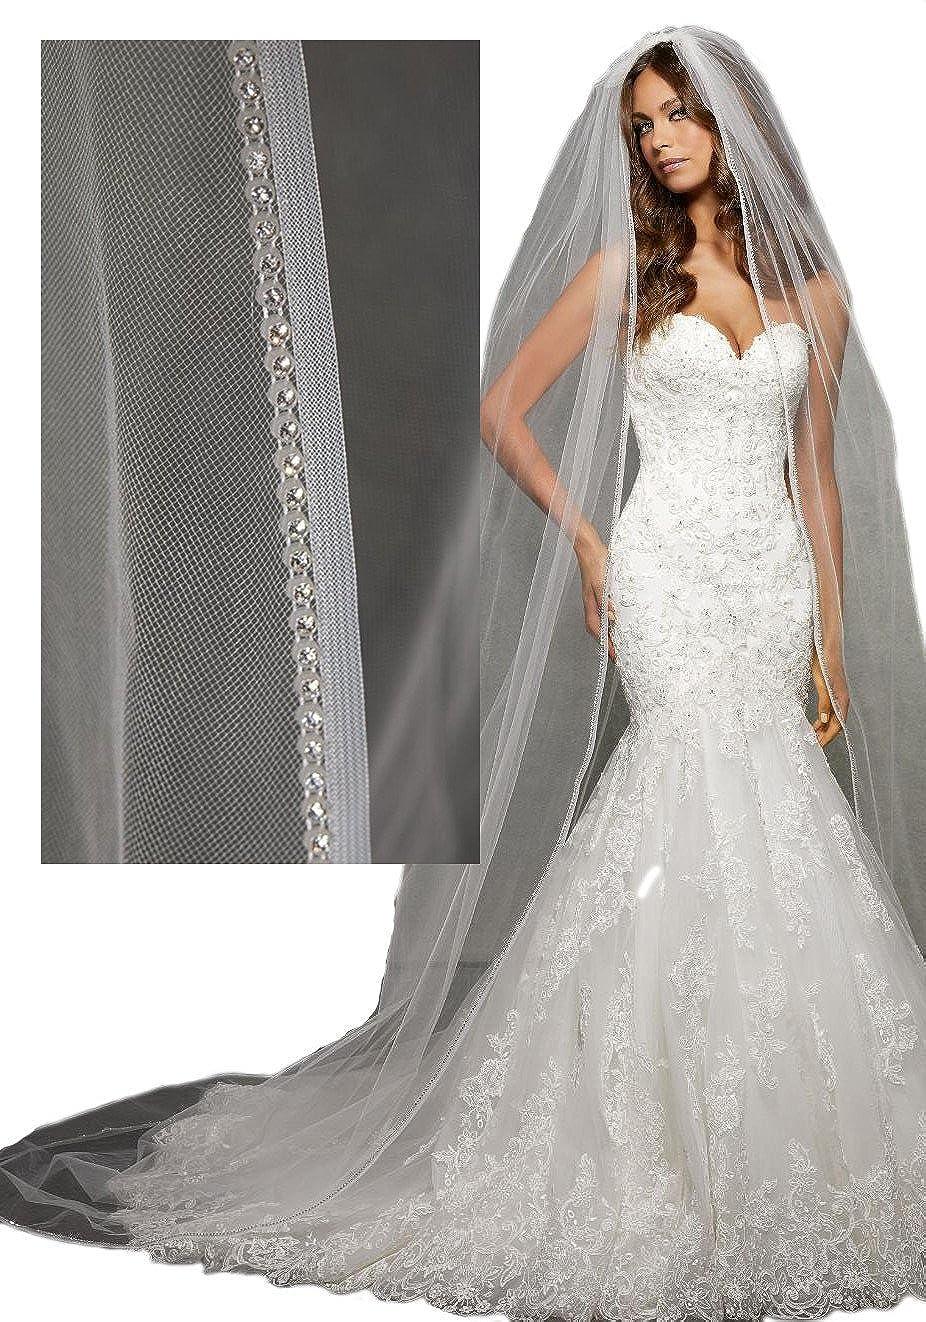 Passat Champagne Single Tier 3m Cathedral Wedding Bridal Veil Edged